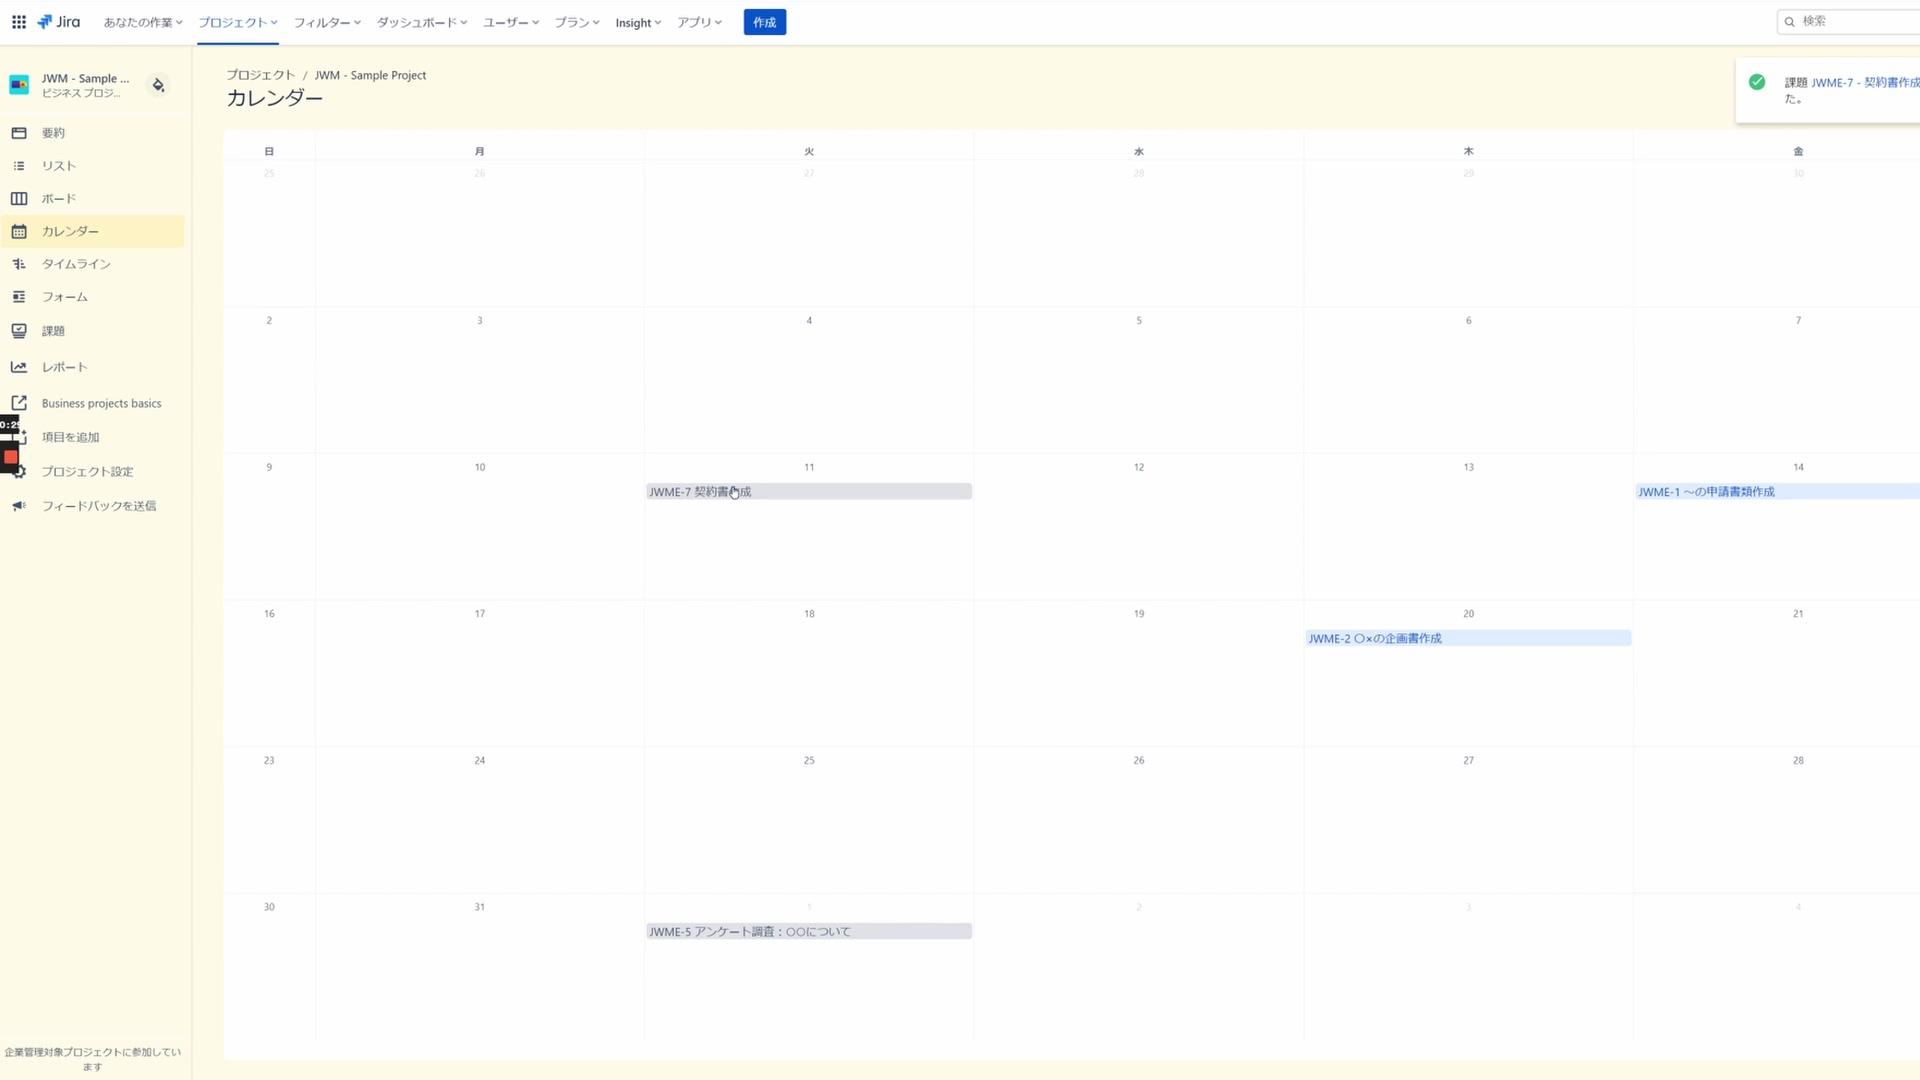 JWM_demo_Calendar